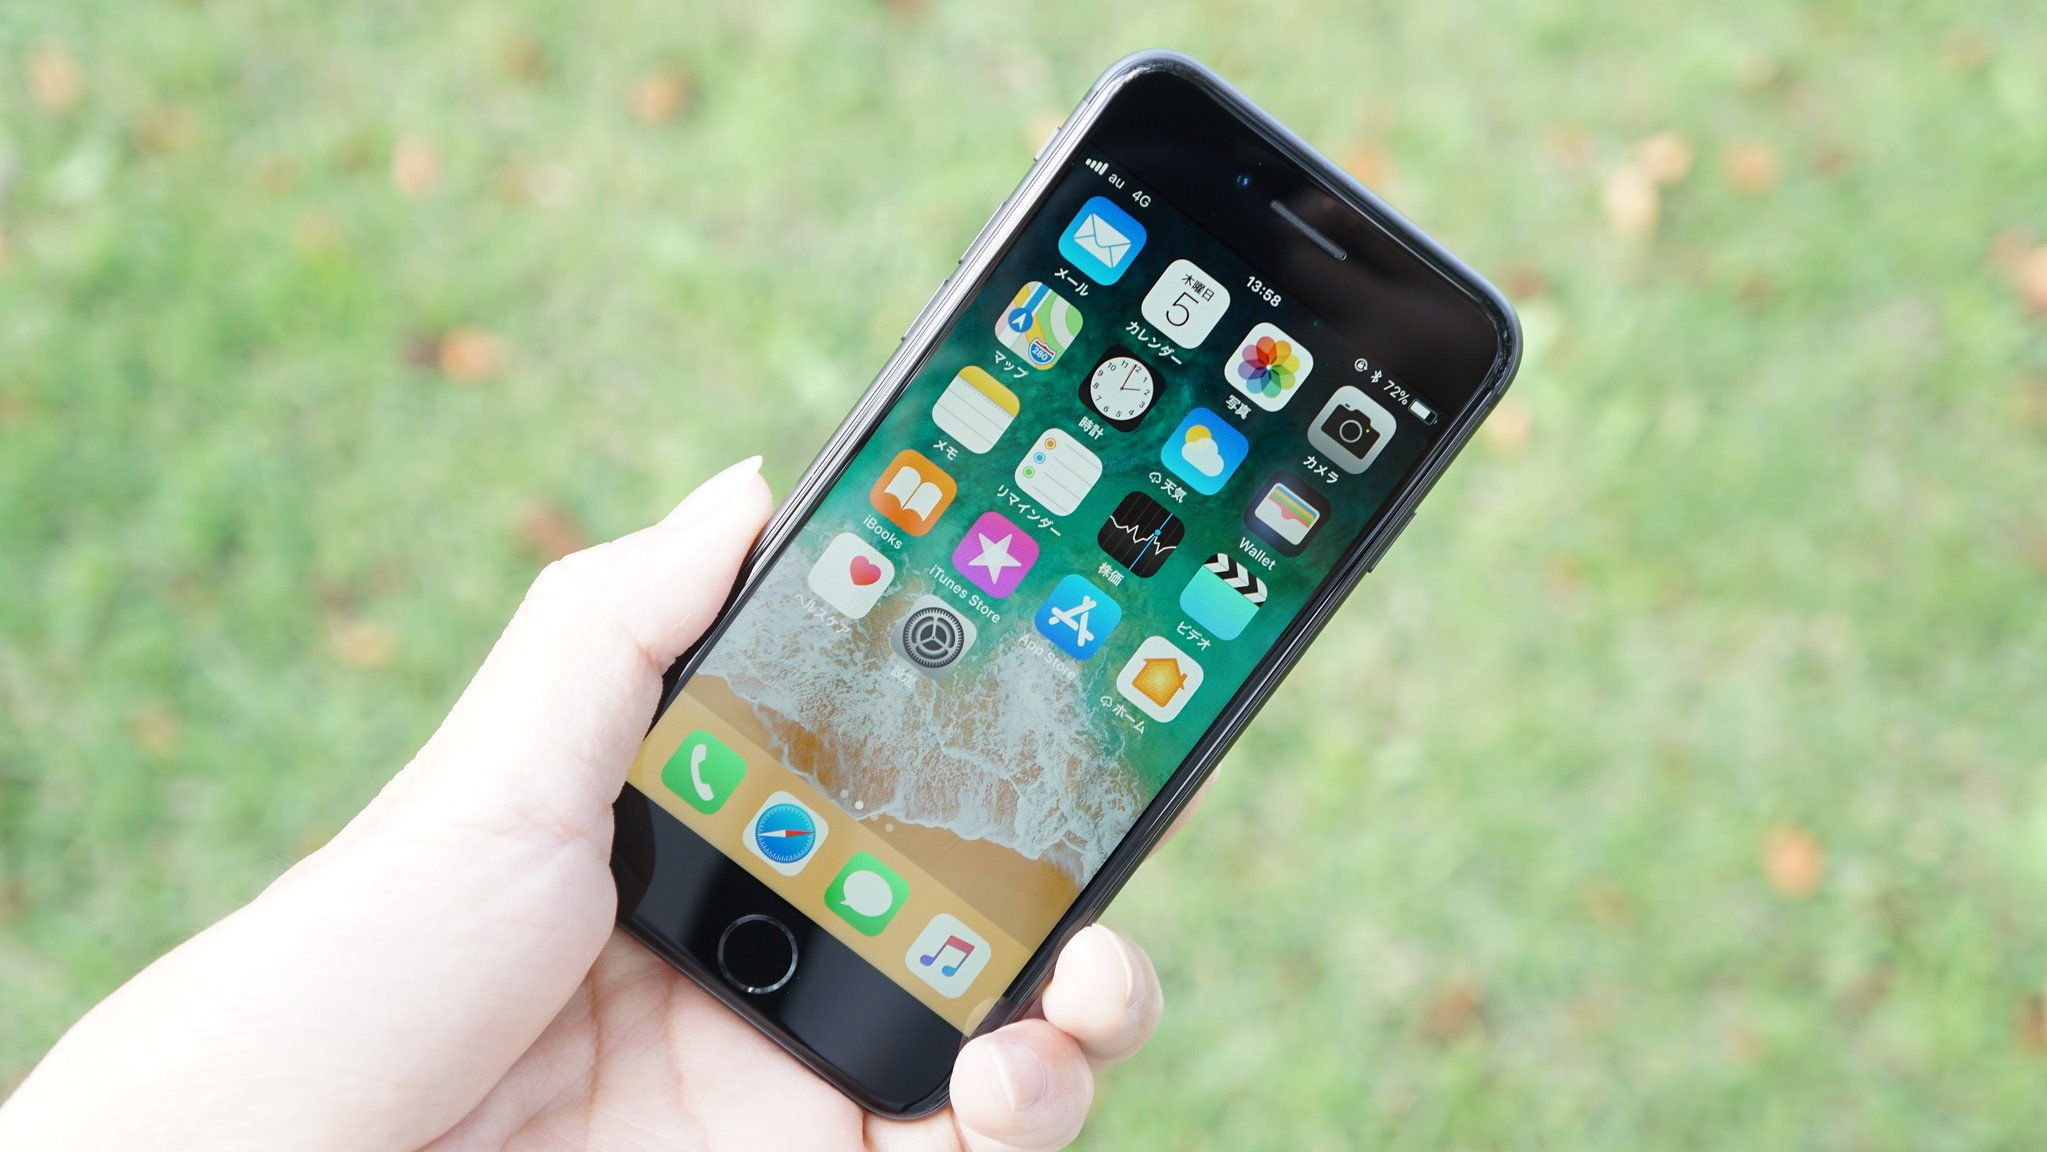 iPhoneが上位独占。日本で一番売れたスマホは「iPhone 8」